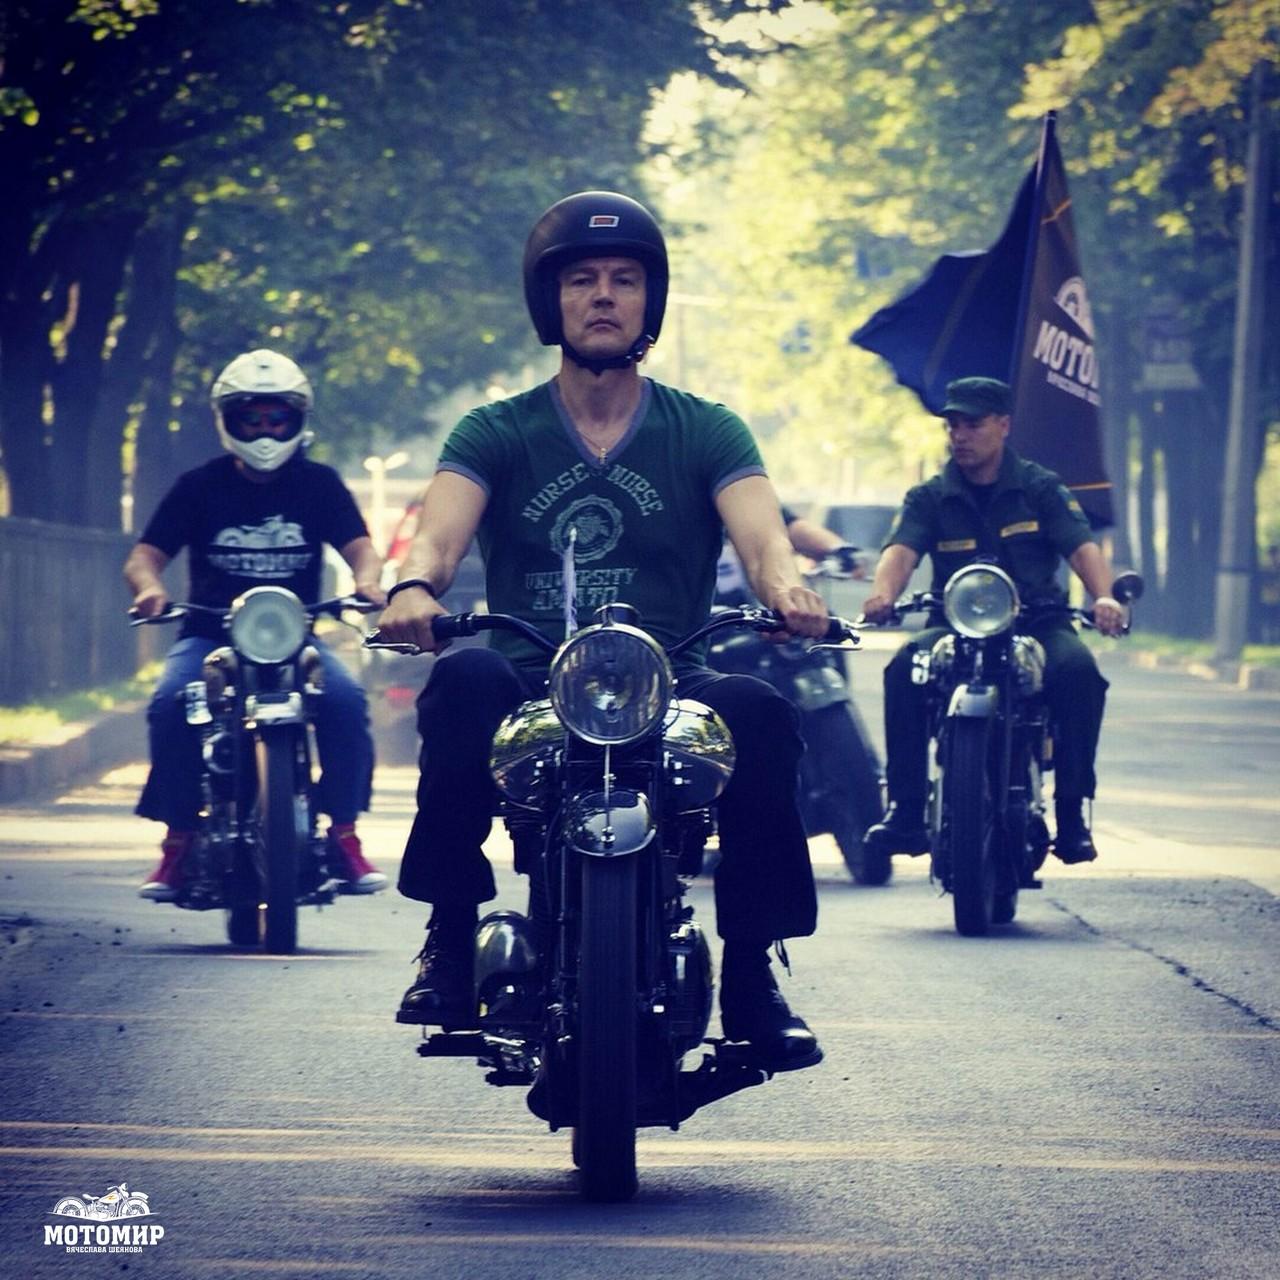 mototourism-memories-web-05